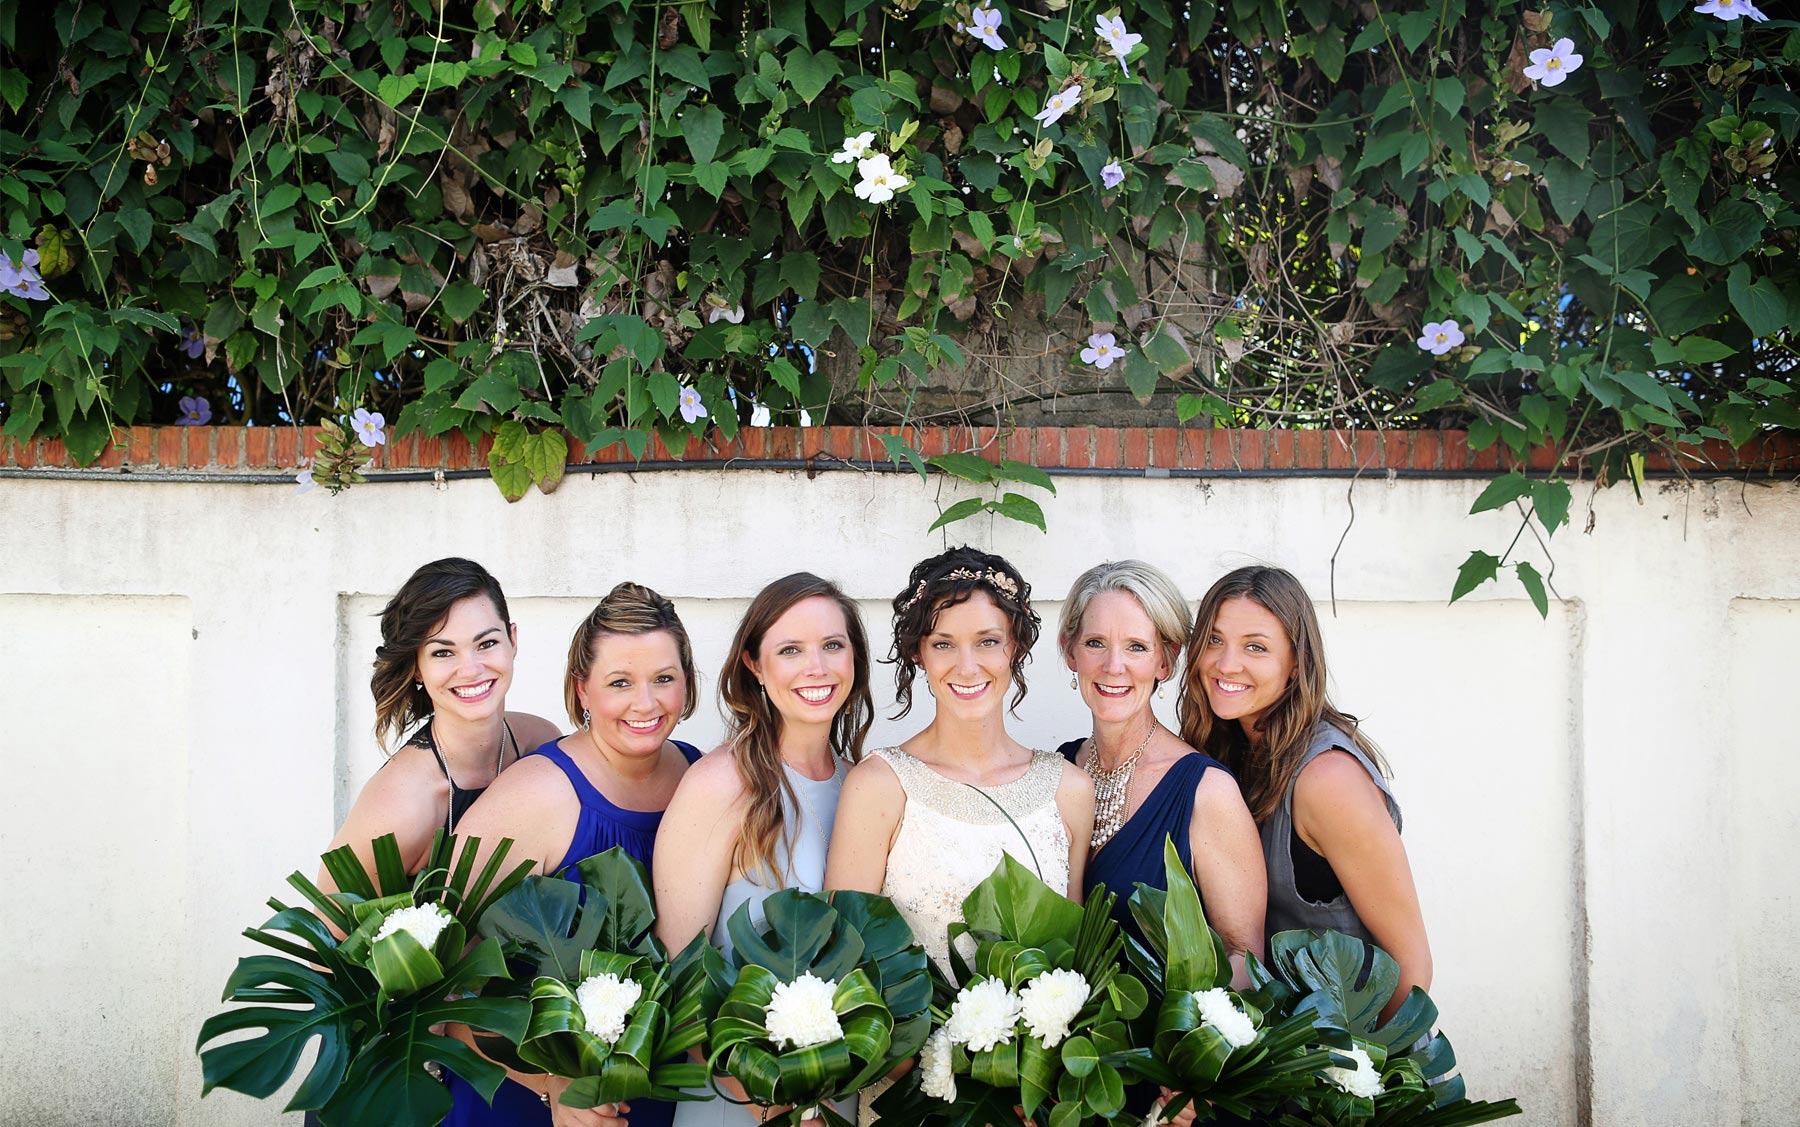 13-Costa-Rica-Wedding-Photography-by-Vick-Photography-Jaco-Tropical-Beach-Villa-Caletas-Resort-Wedding-Party-Group-Alli-and-Duncan.jpg